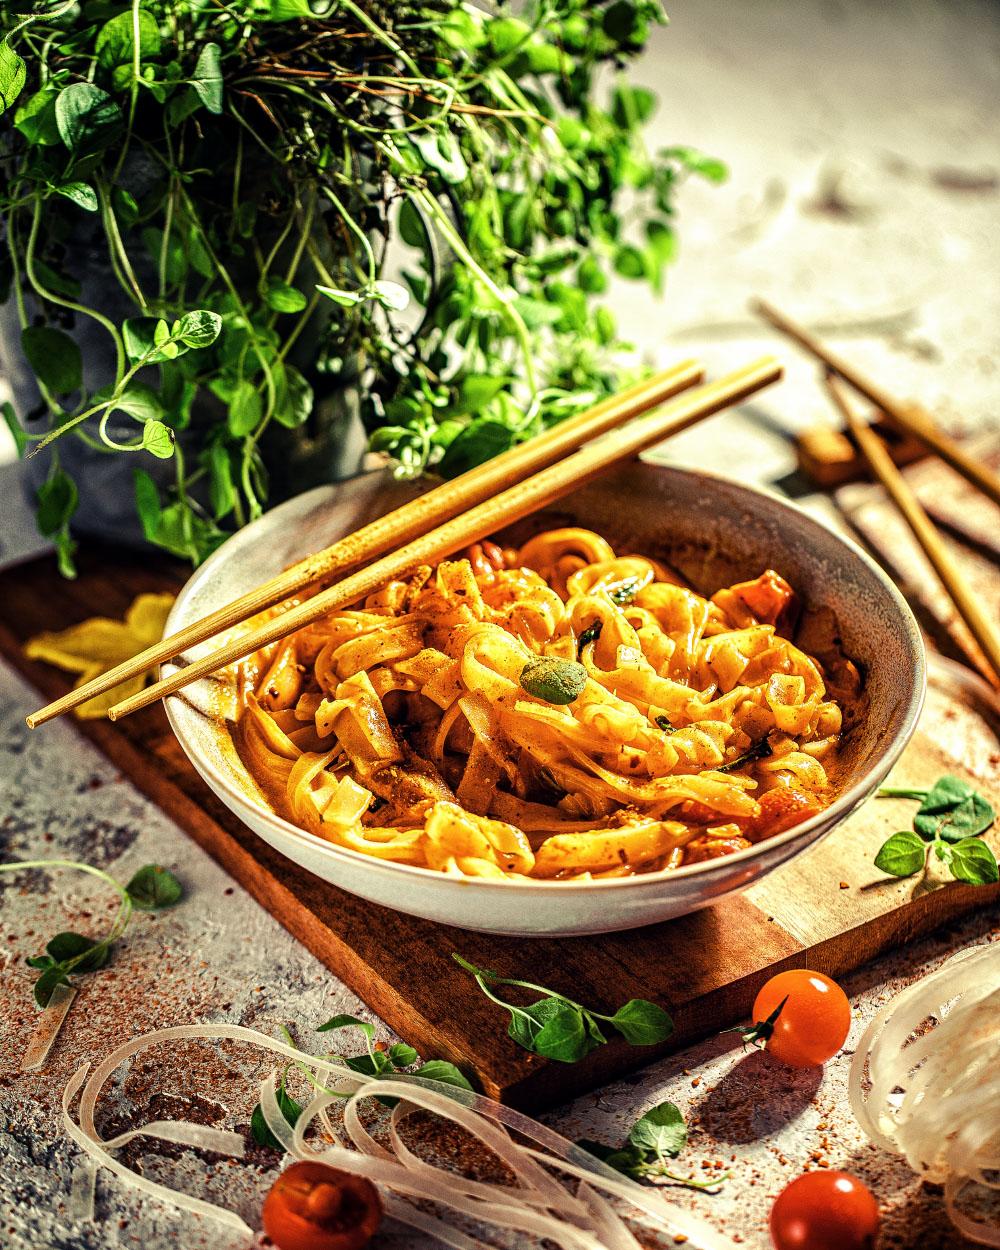 SCremige Thai-Nudeln - nudeln reishunger currychnelle Thai Creme-nudeln reishunger curry